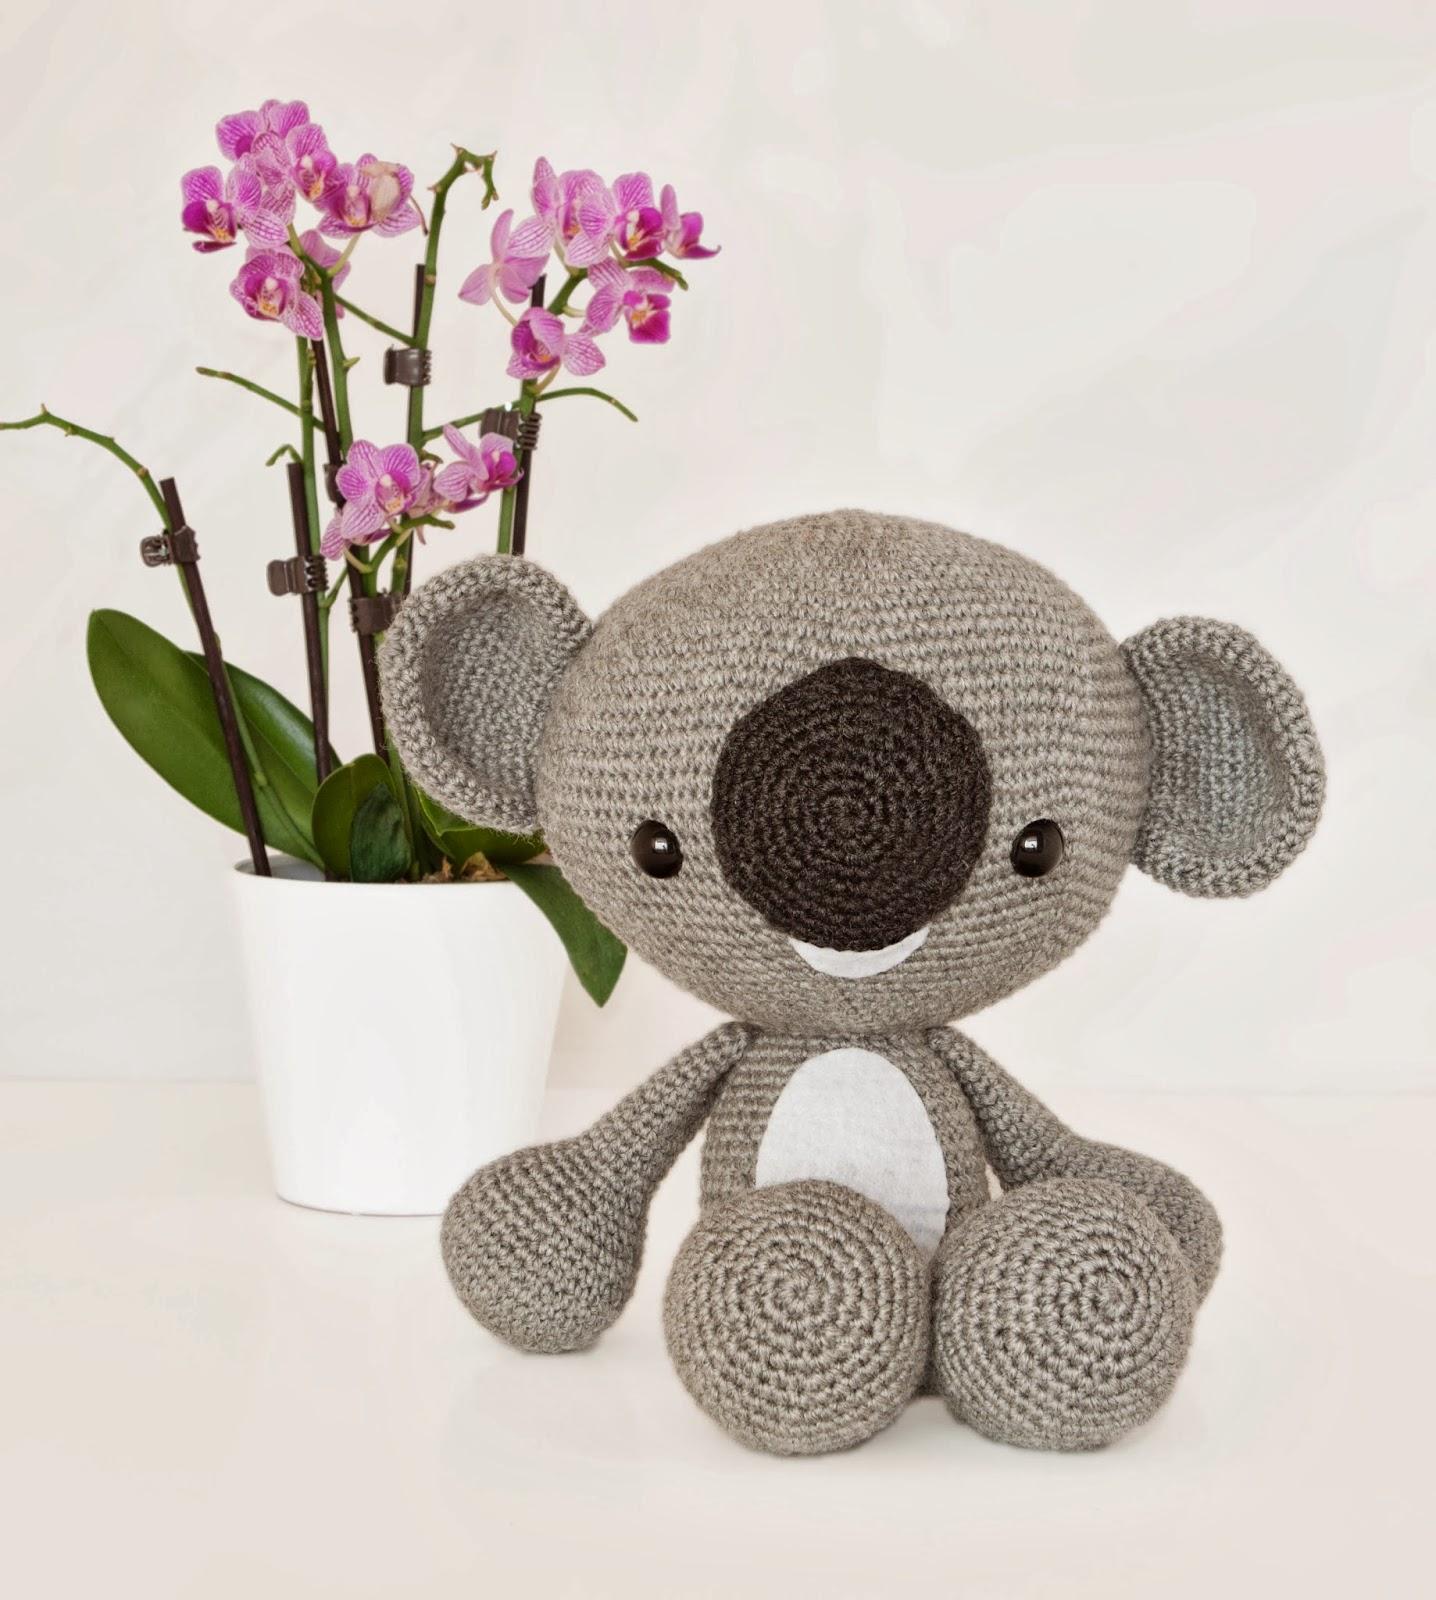 Patron Amigurumi De Koala : Patron De Oso Panda Amigurumi apexwallpapers.com